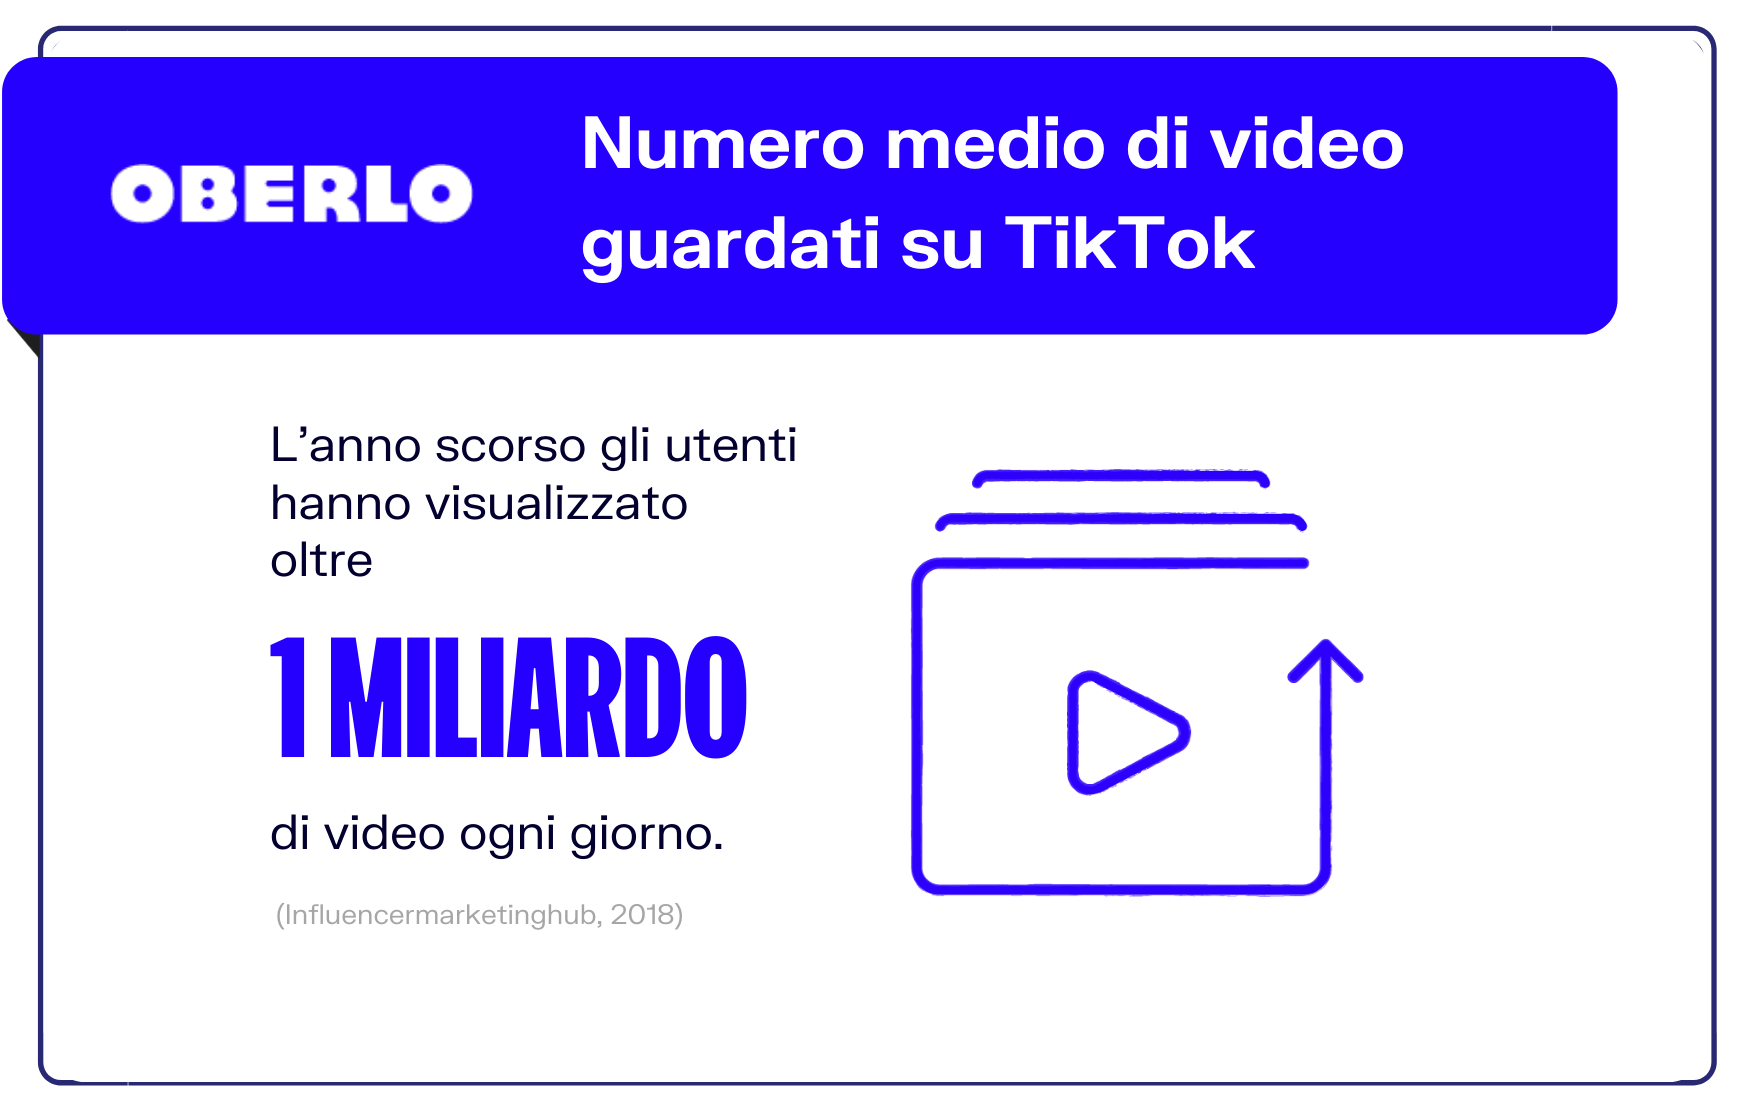 video guardati su tiktok